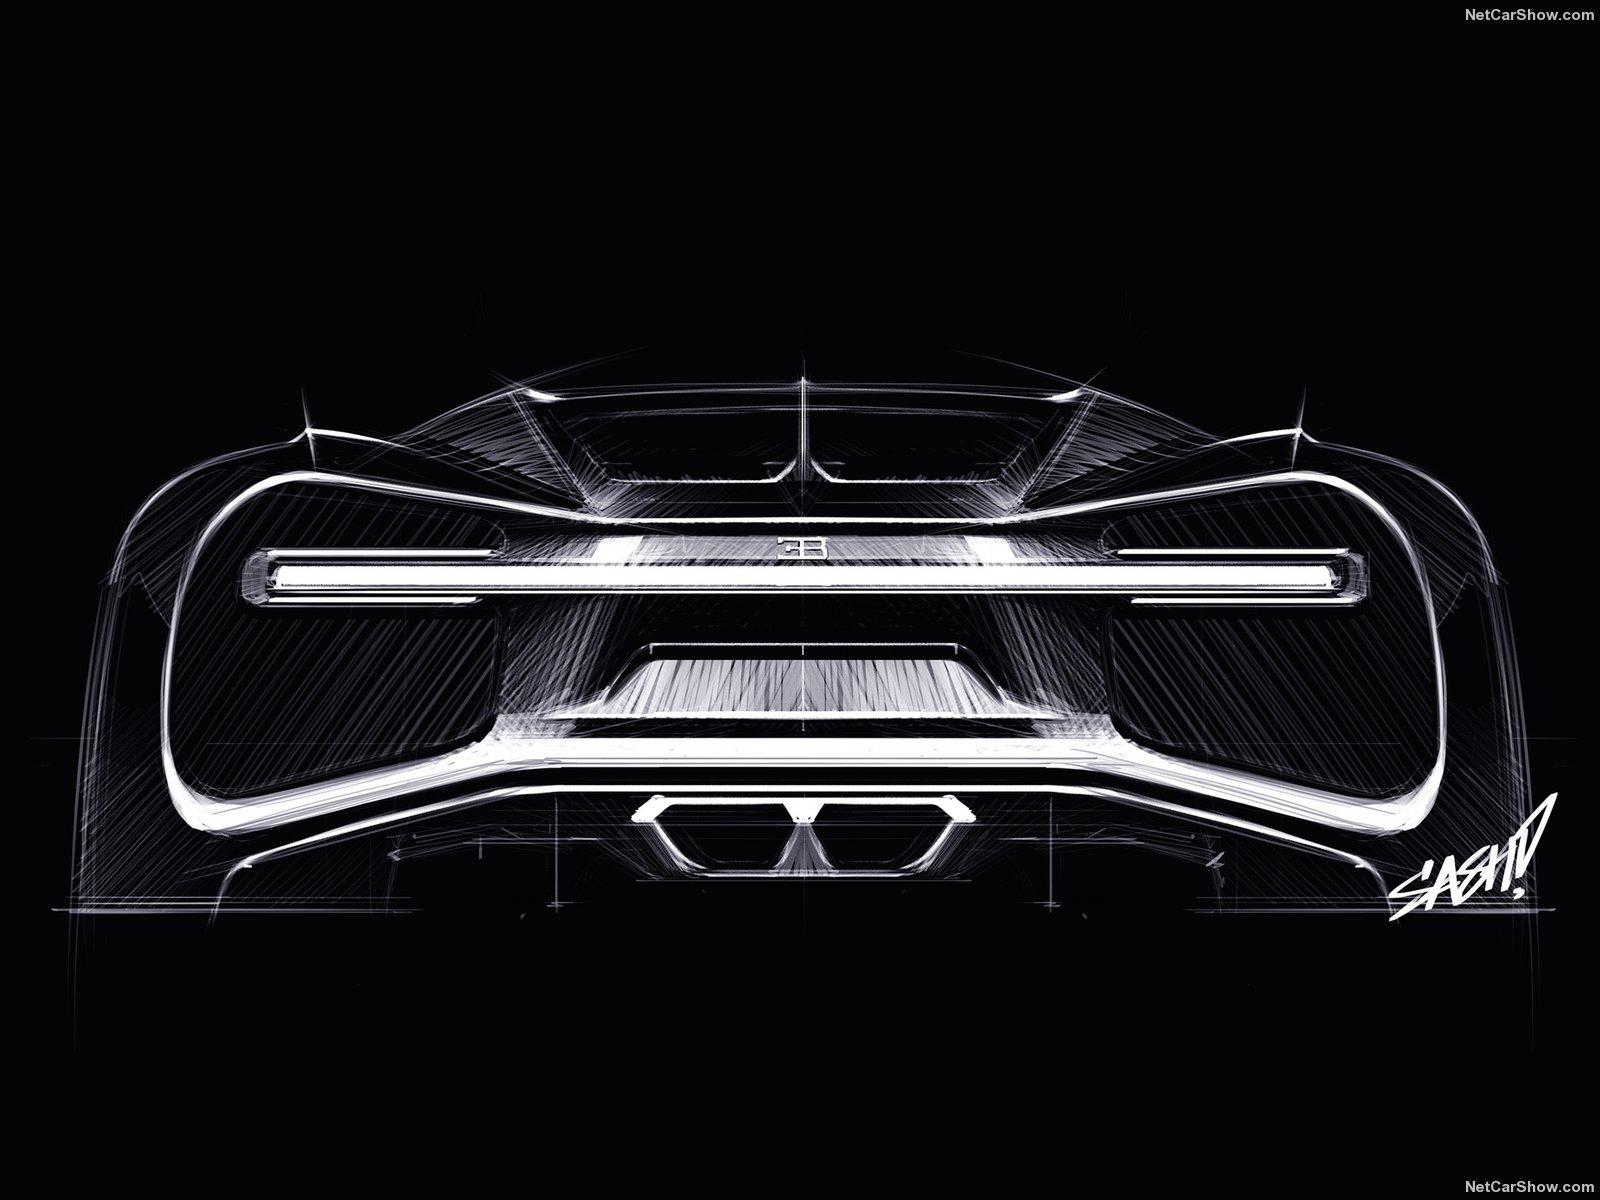 Bugatti-Chiron_2017_1600x1200_wallpaper_43